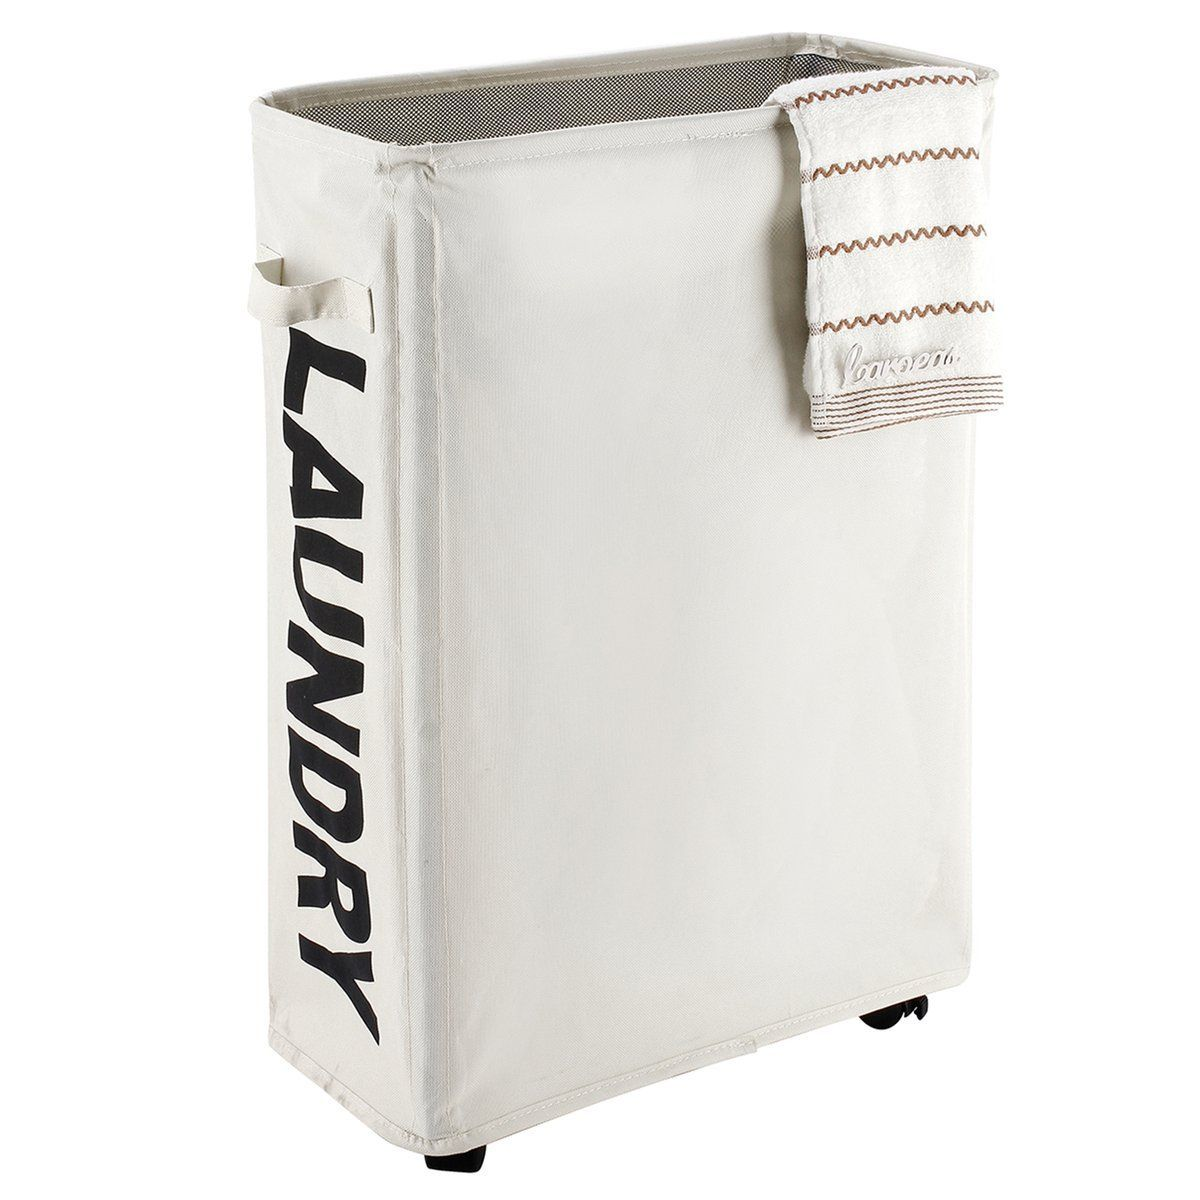 Diy Laundry Storage Panosundaki Pin